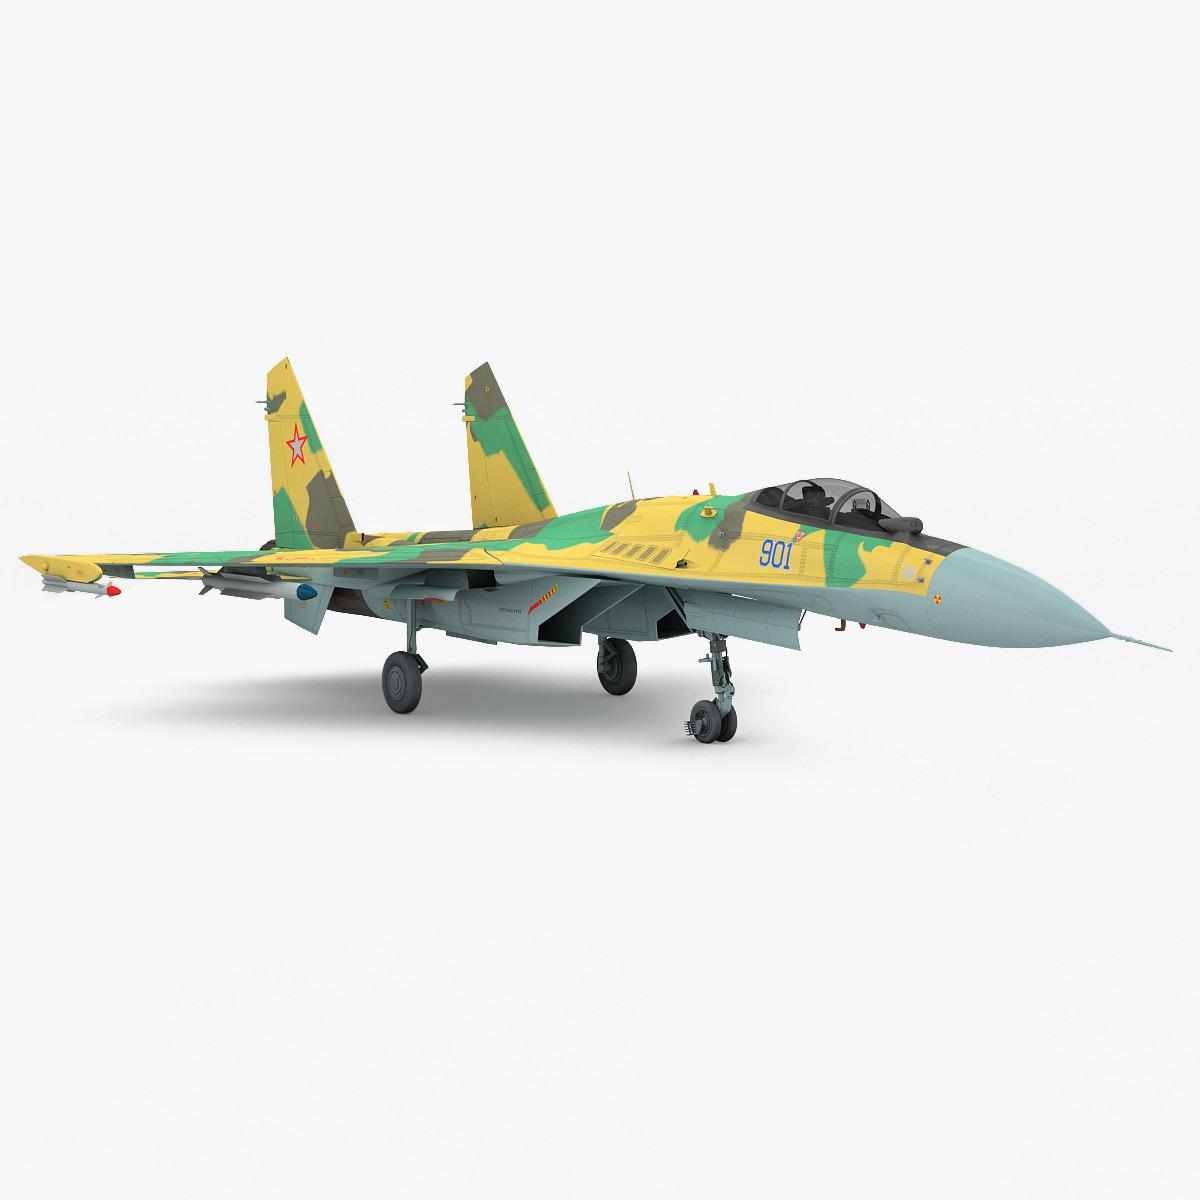 Russian_Multirole_Fighter_Sukhoi_Su35_v2_Static_000.jpg00b28c38-cf2f-46f1-9996-84e226eedd51Original.jpg